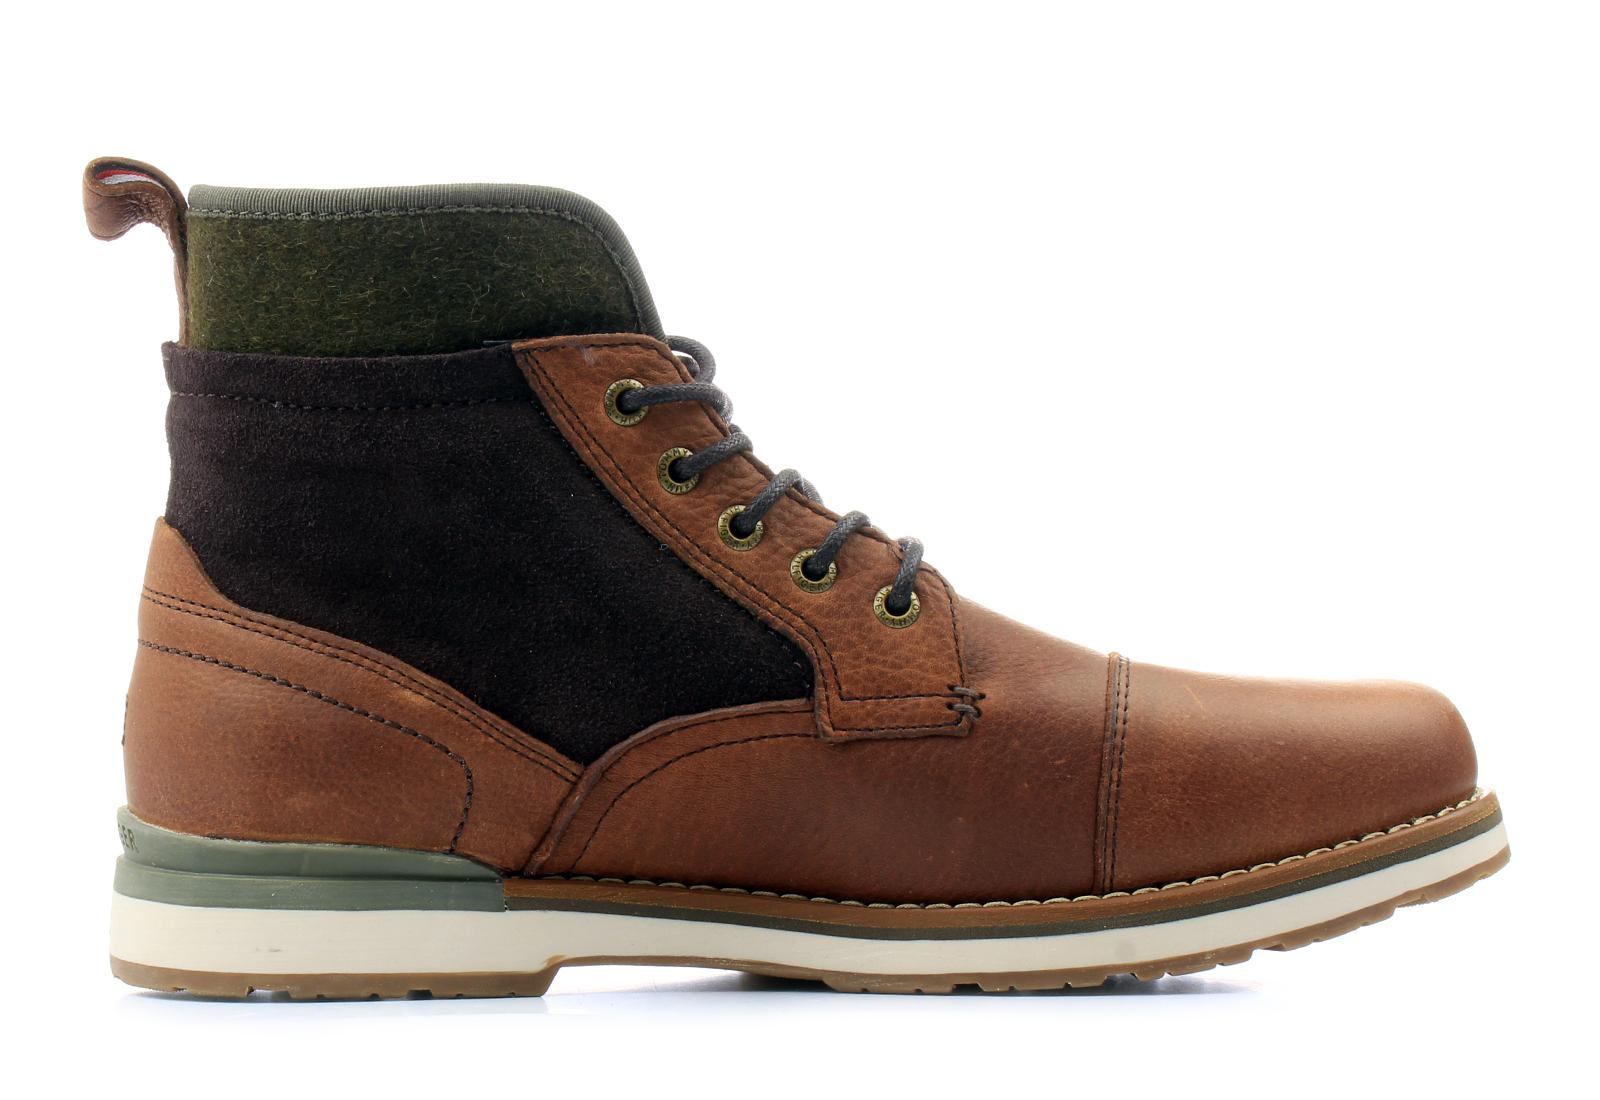 Tommy Hilfiger Bakancs - Rover 1c - 17F-1522-901 - Office Shoes ... 77d45798b6